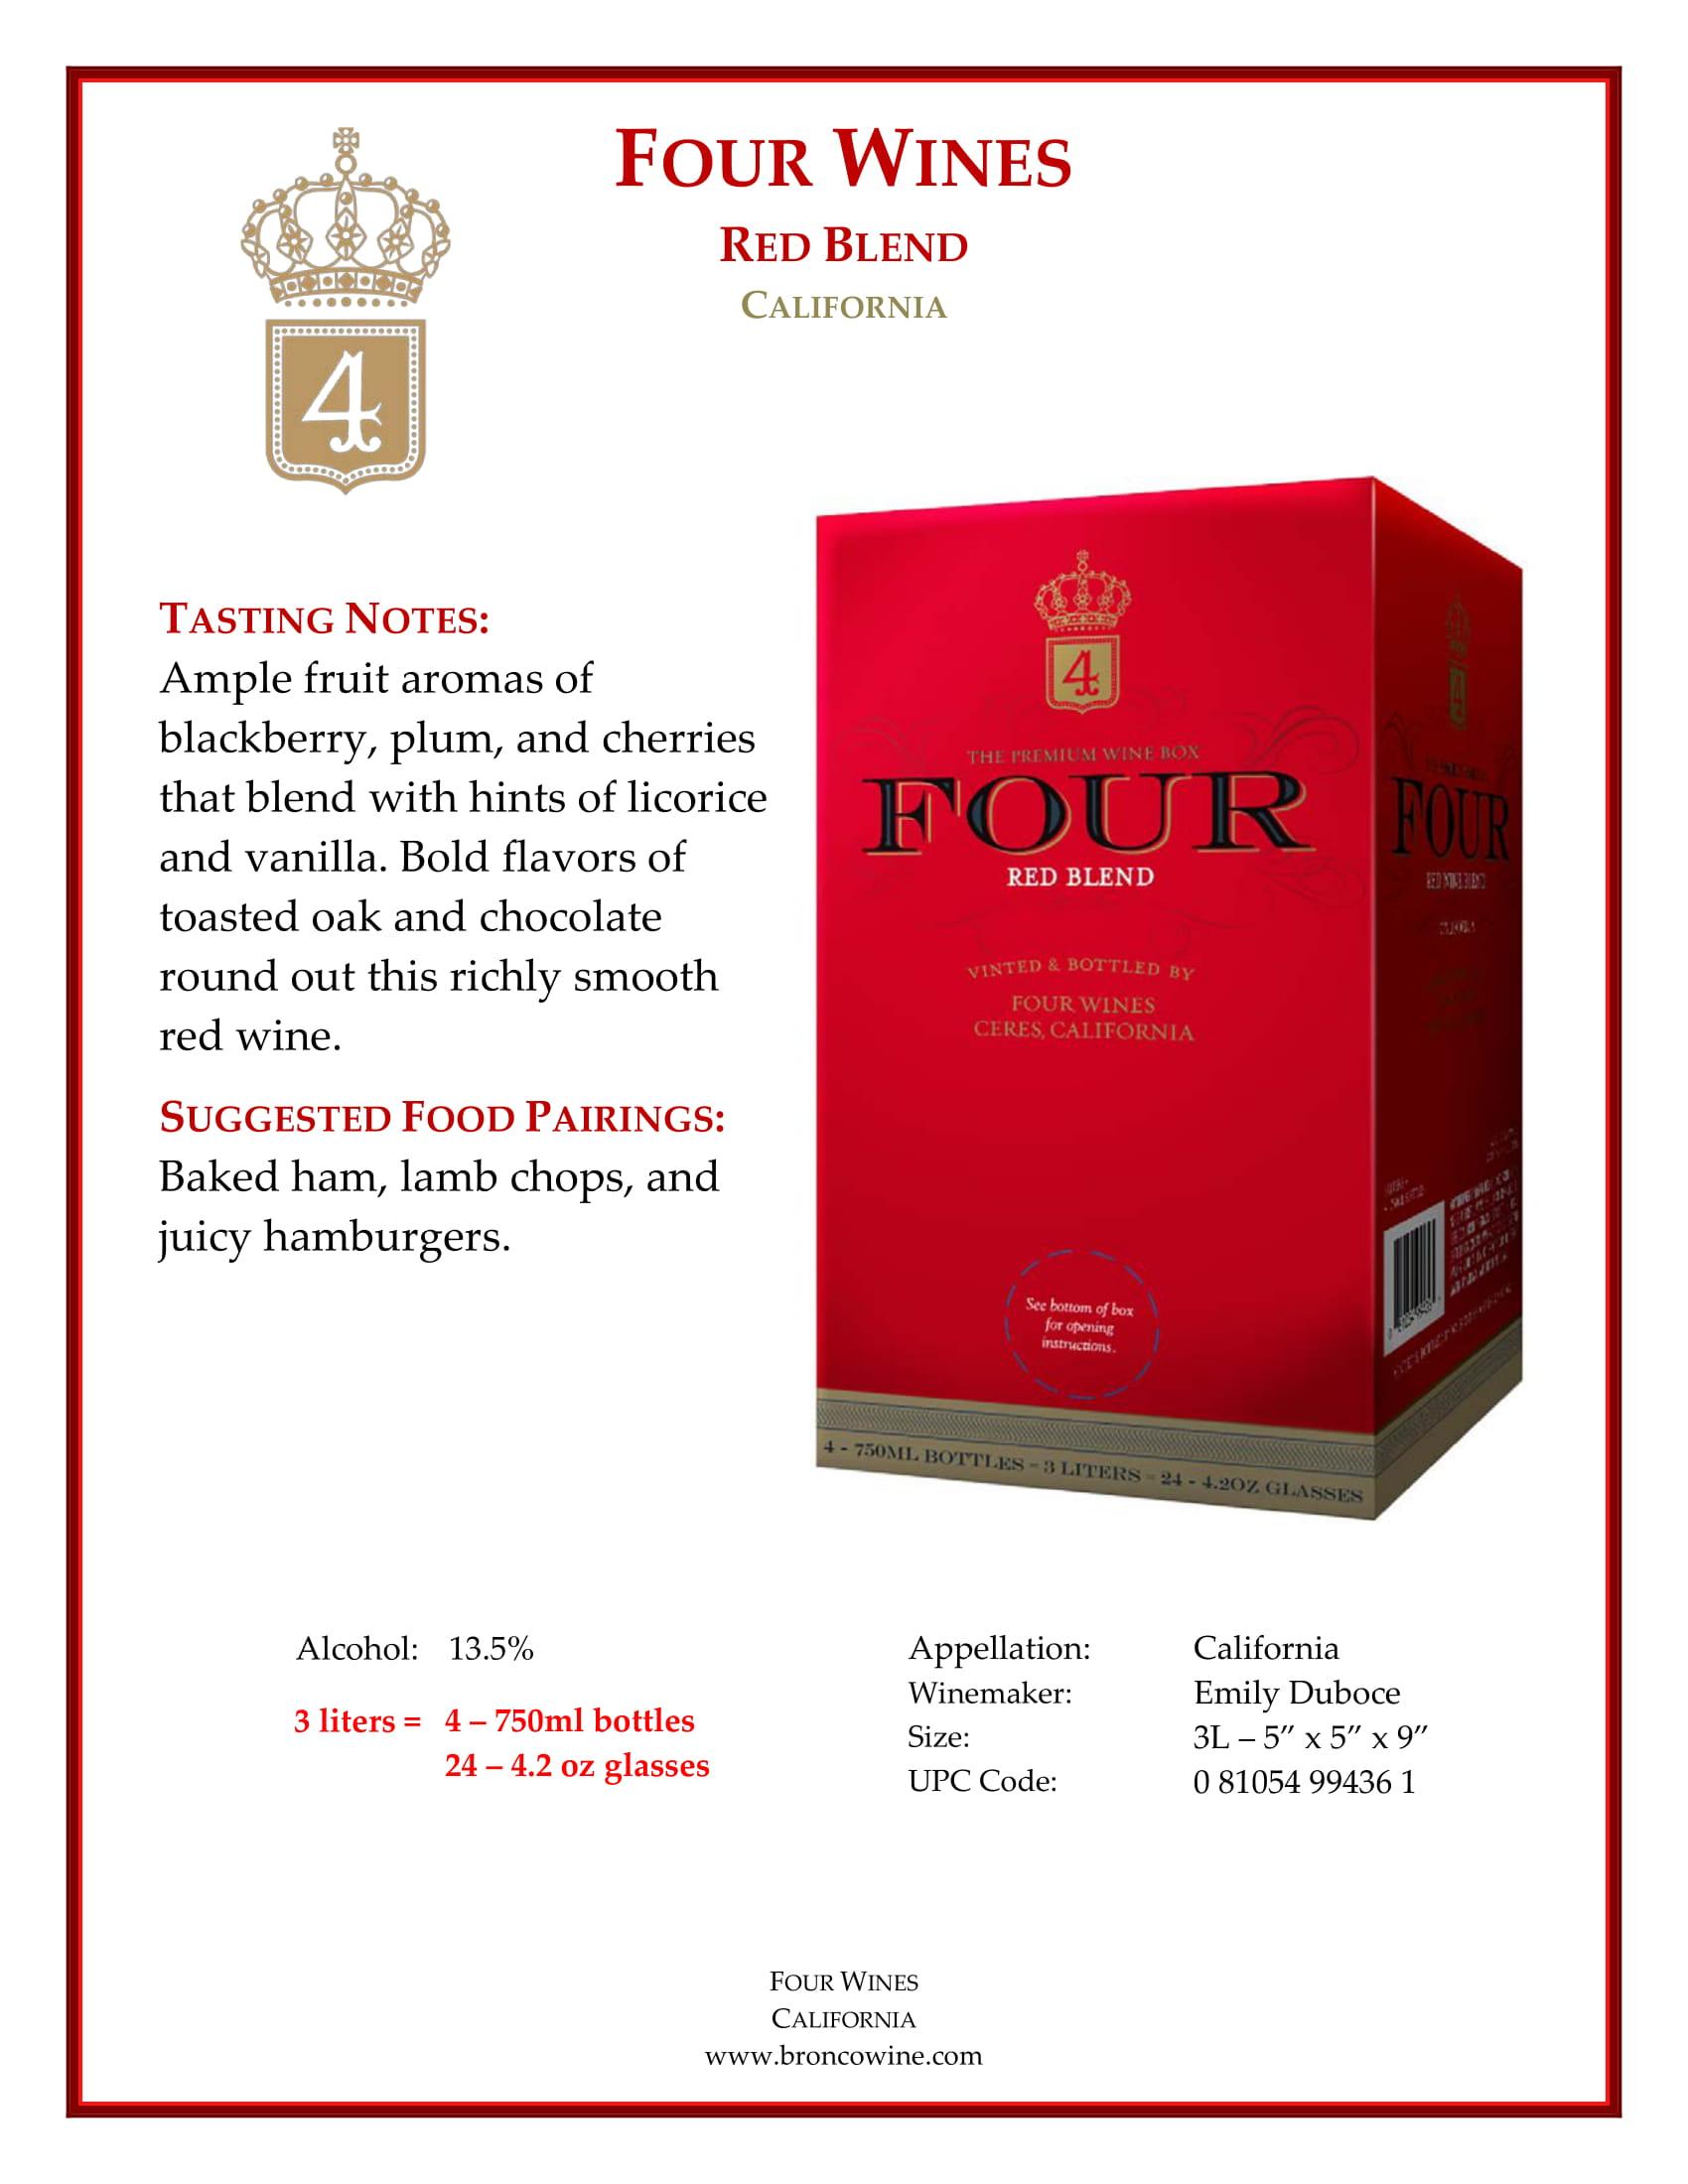 Four Wines Red Blend Box Tech Sheet